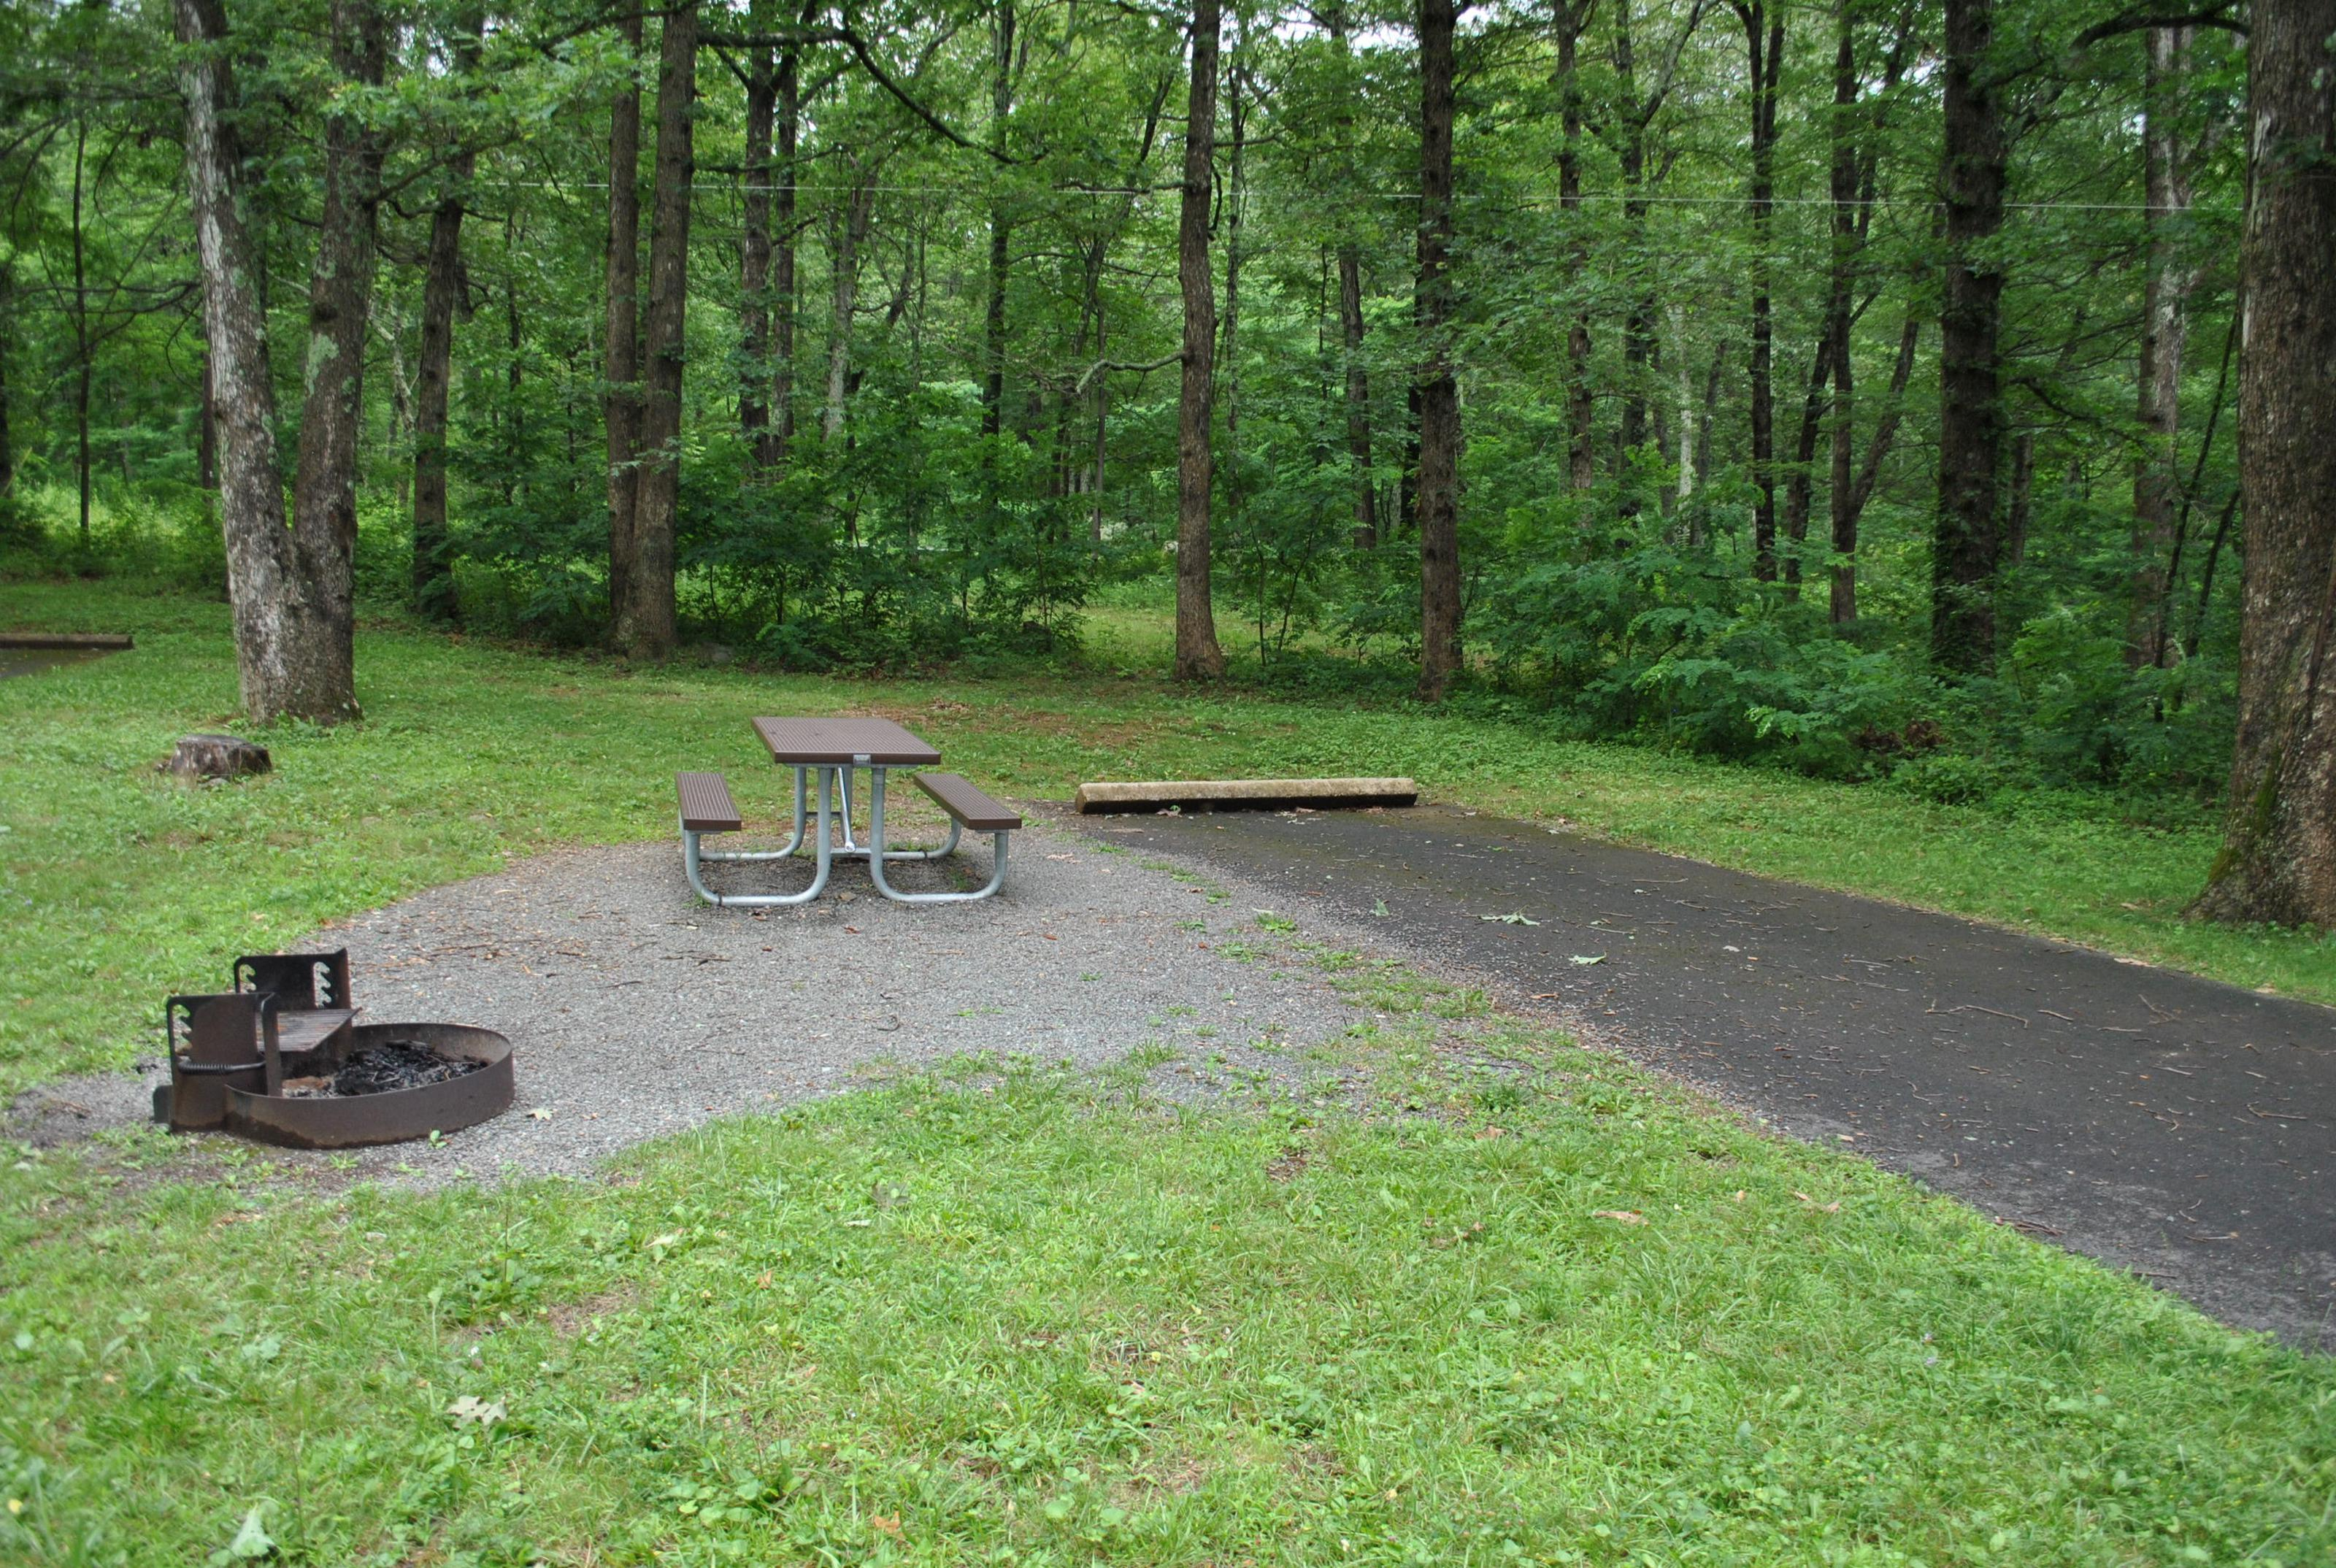 Mathews Arm Campground – Site A084